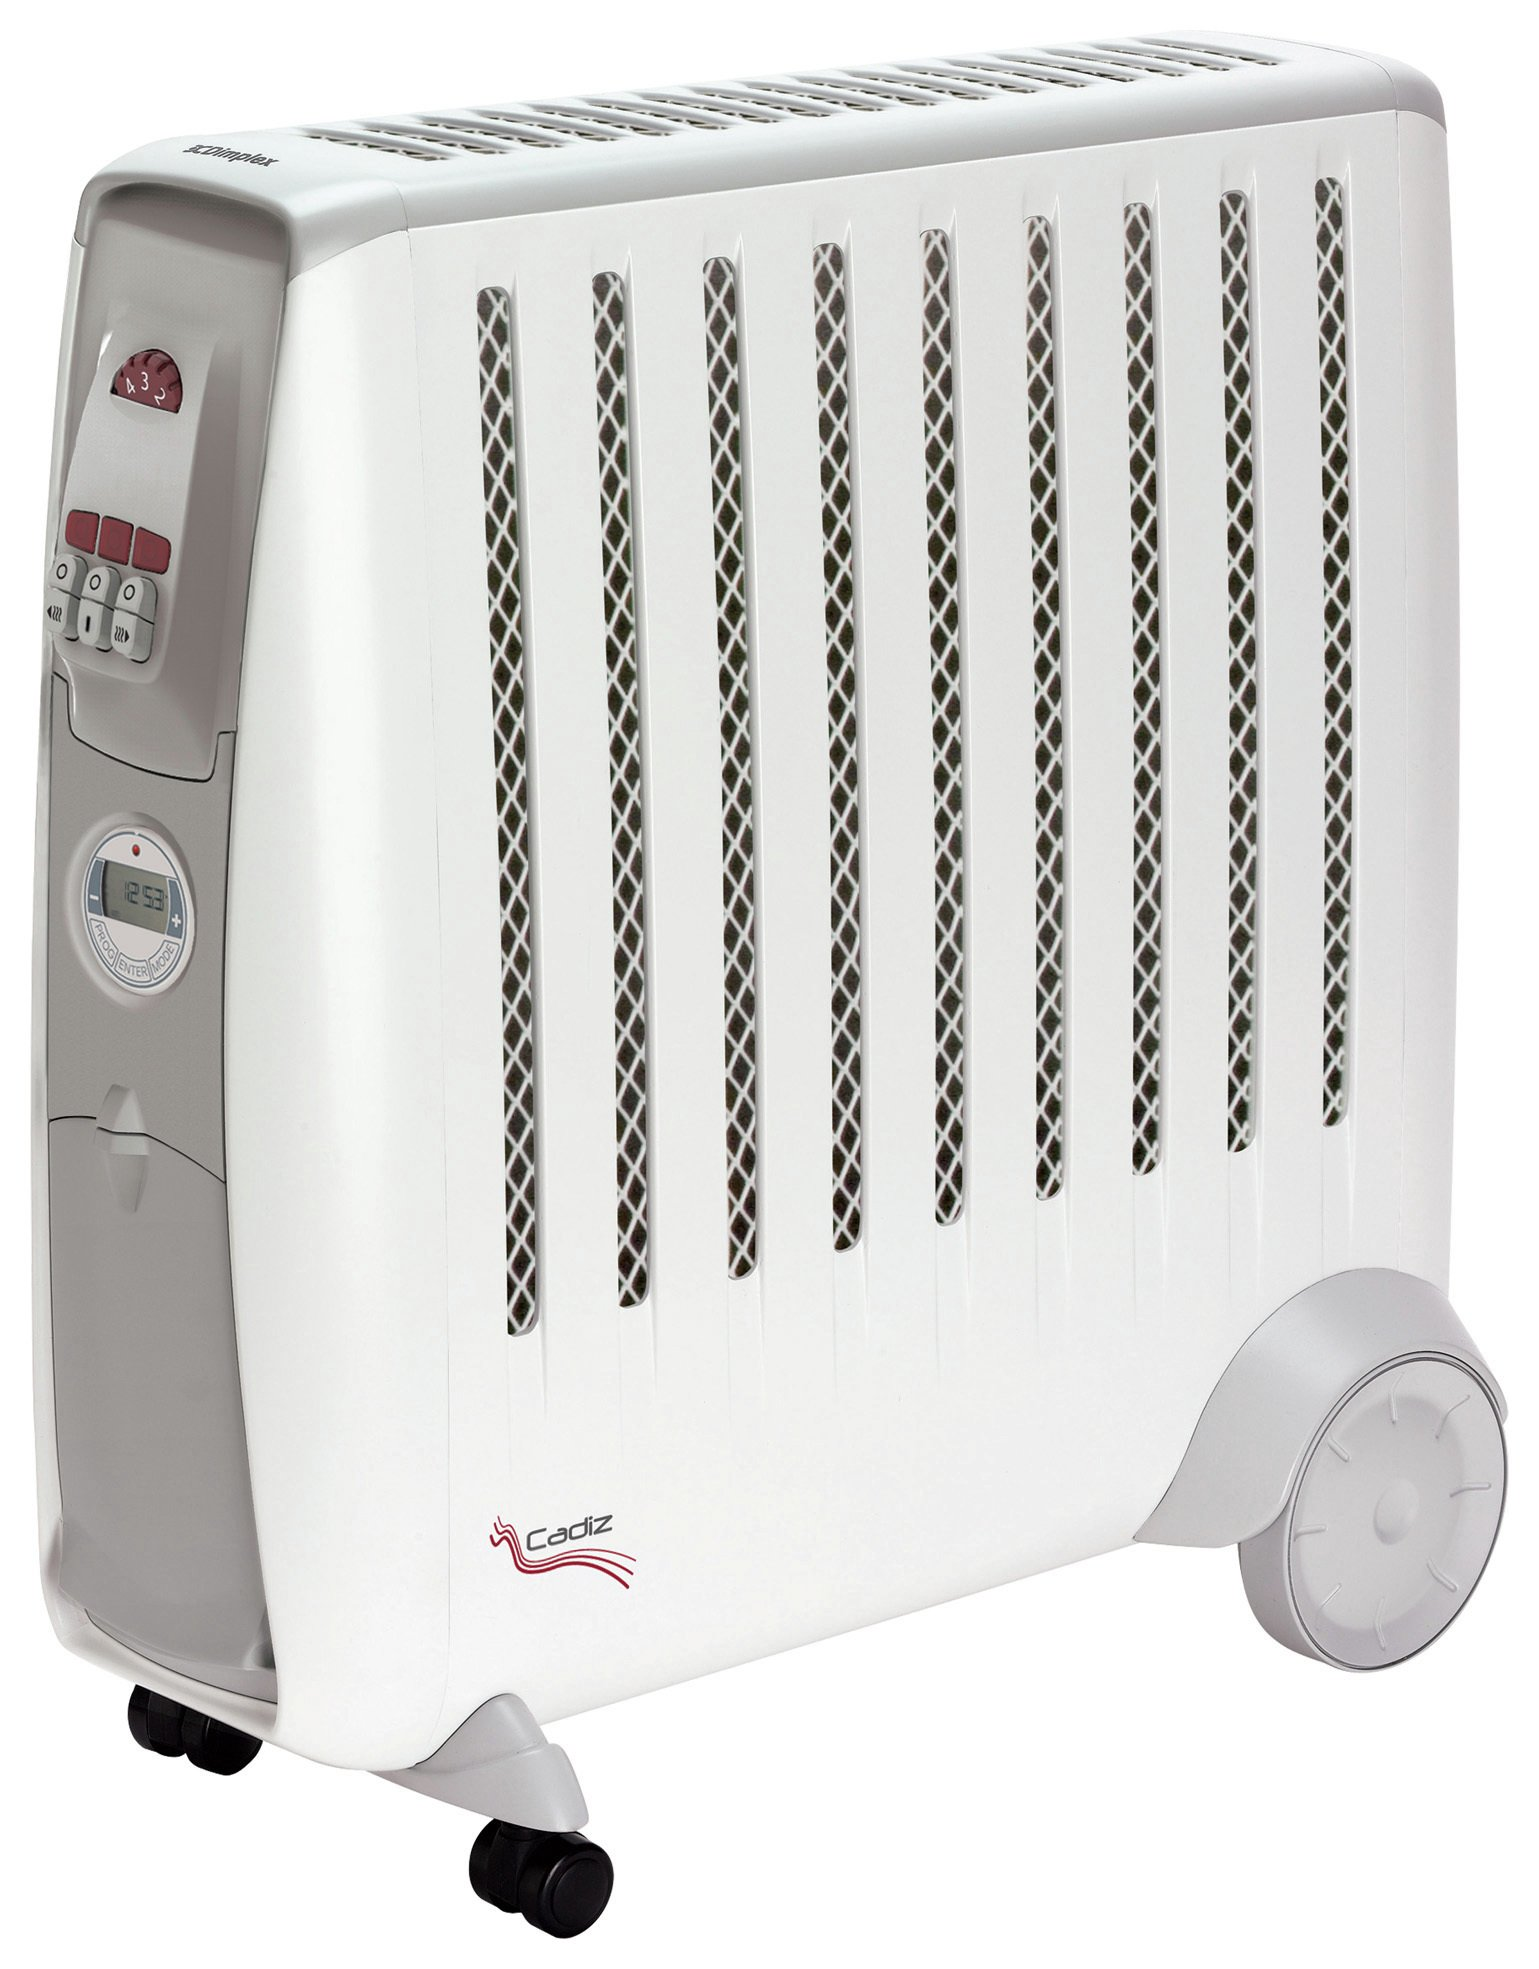 Image of Dimplex - Cadiz Eco CDE2Ti 2kW Oil Free Radiator